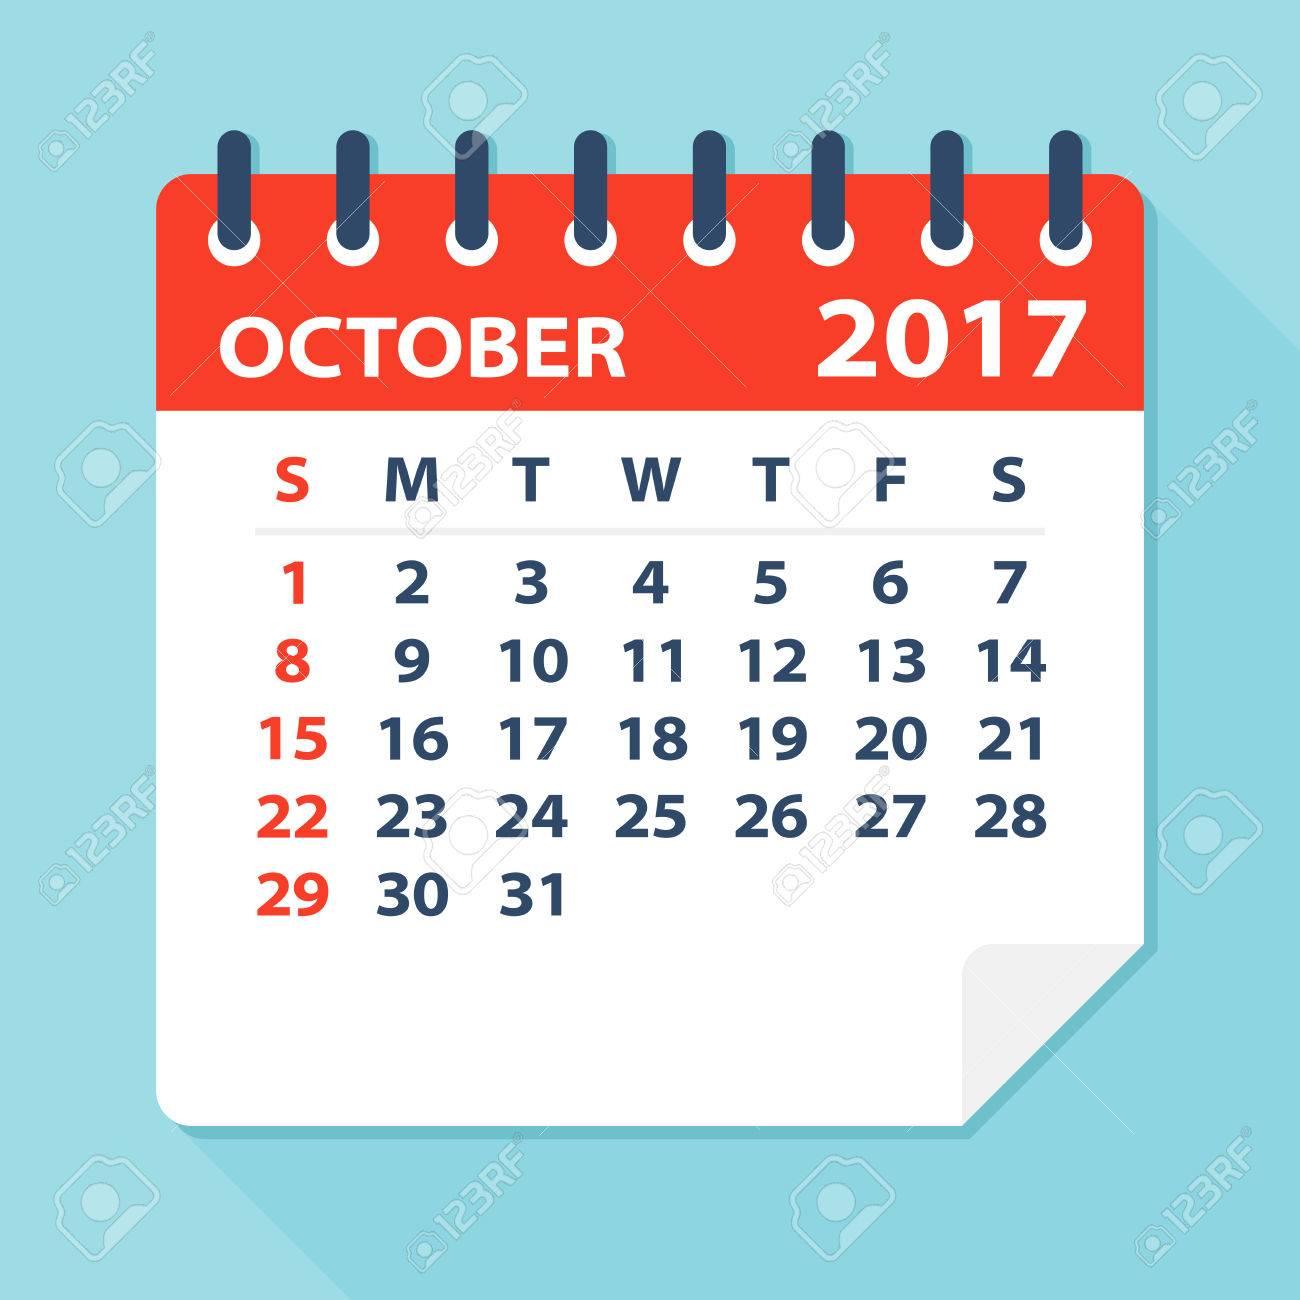 October Calendar 2017 Clipart – Printable Editable Blank Calendar 2017